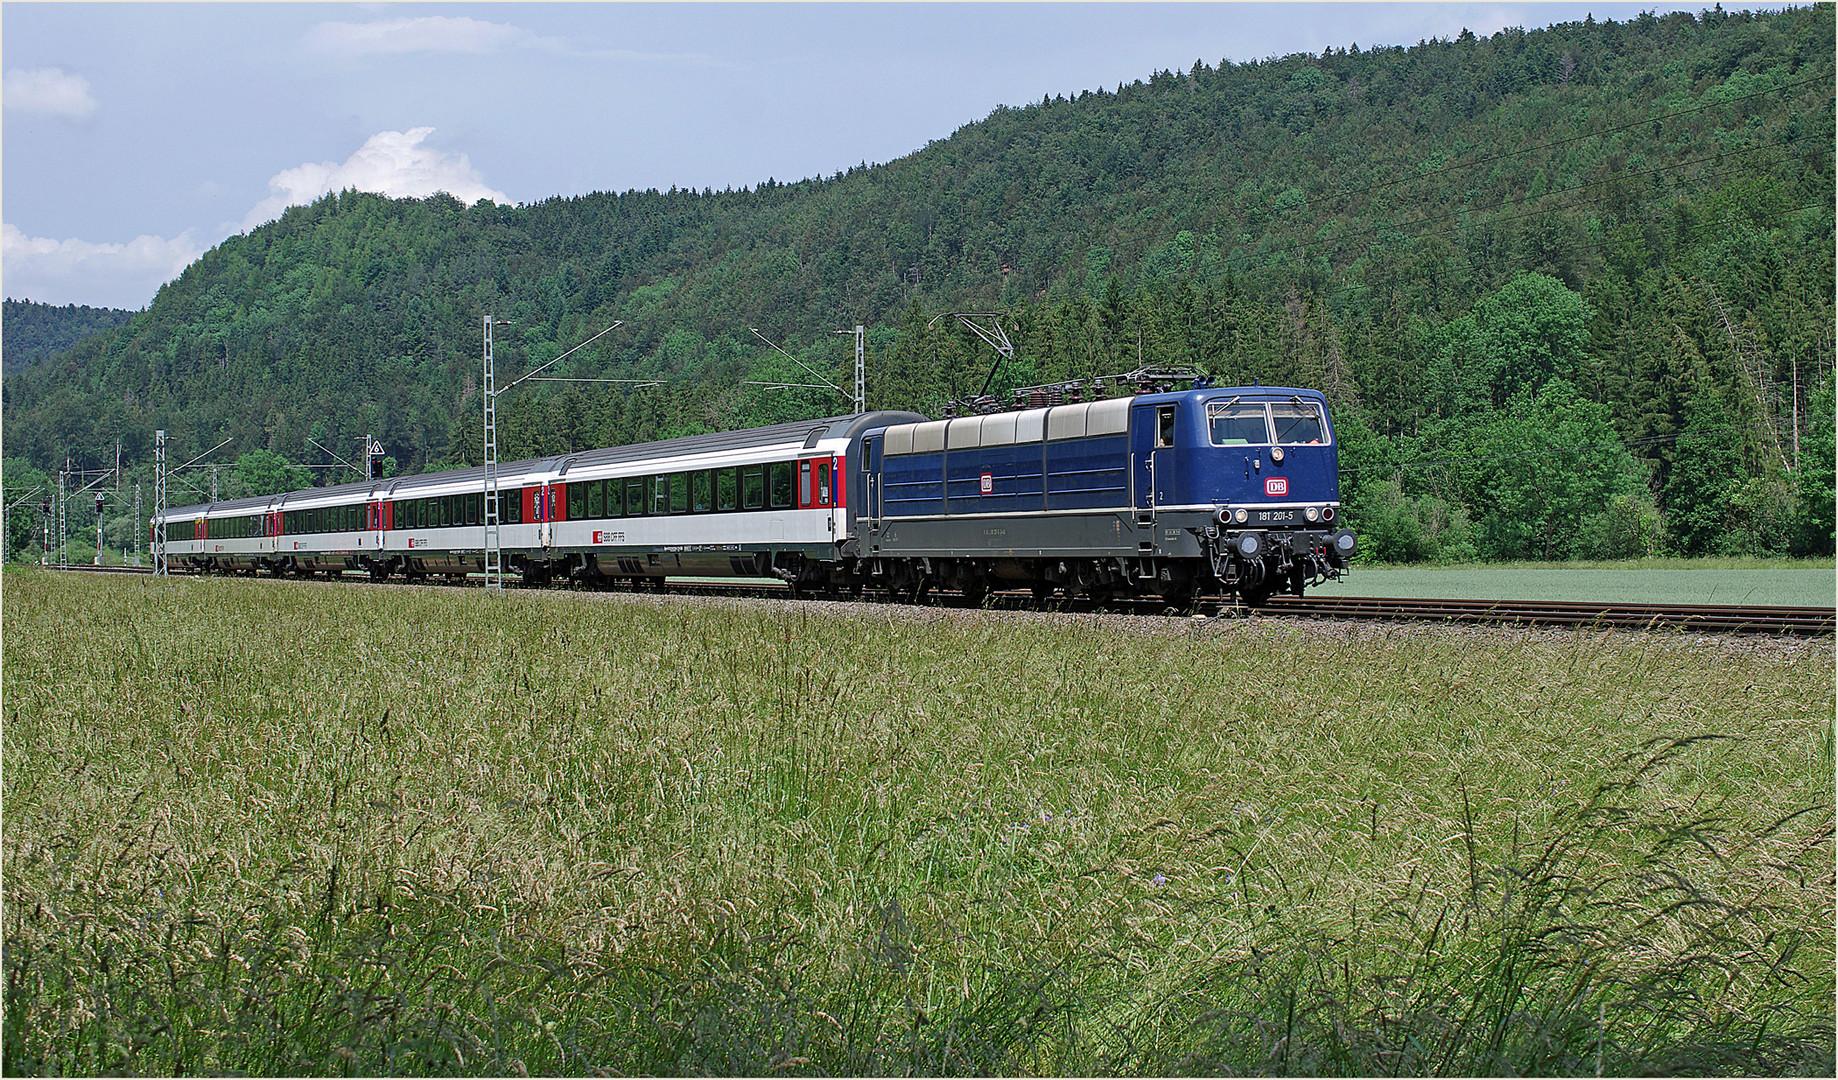 Durchfahrt Betriebsbahnhof Grünholz